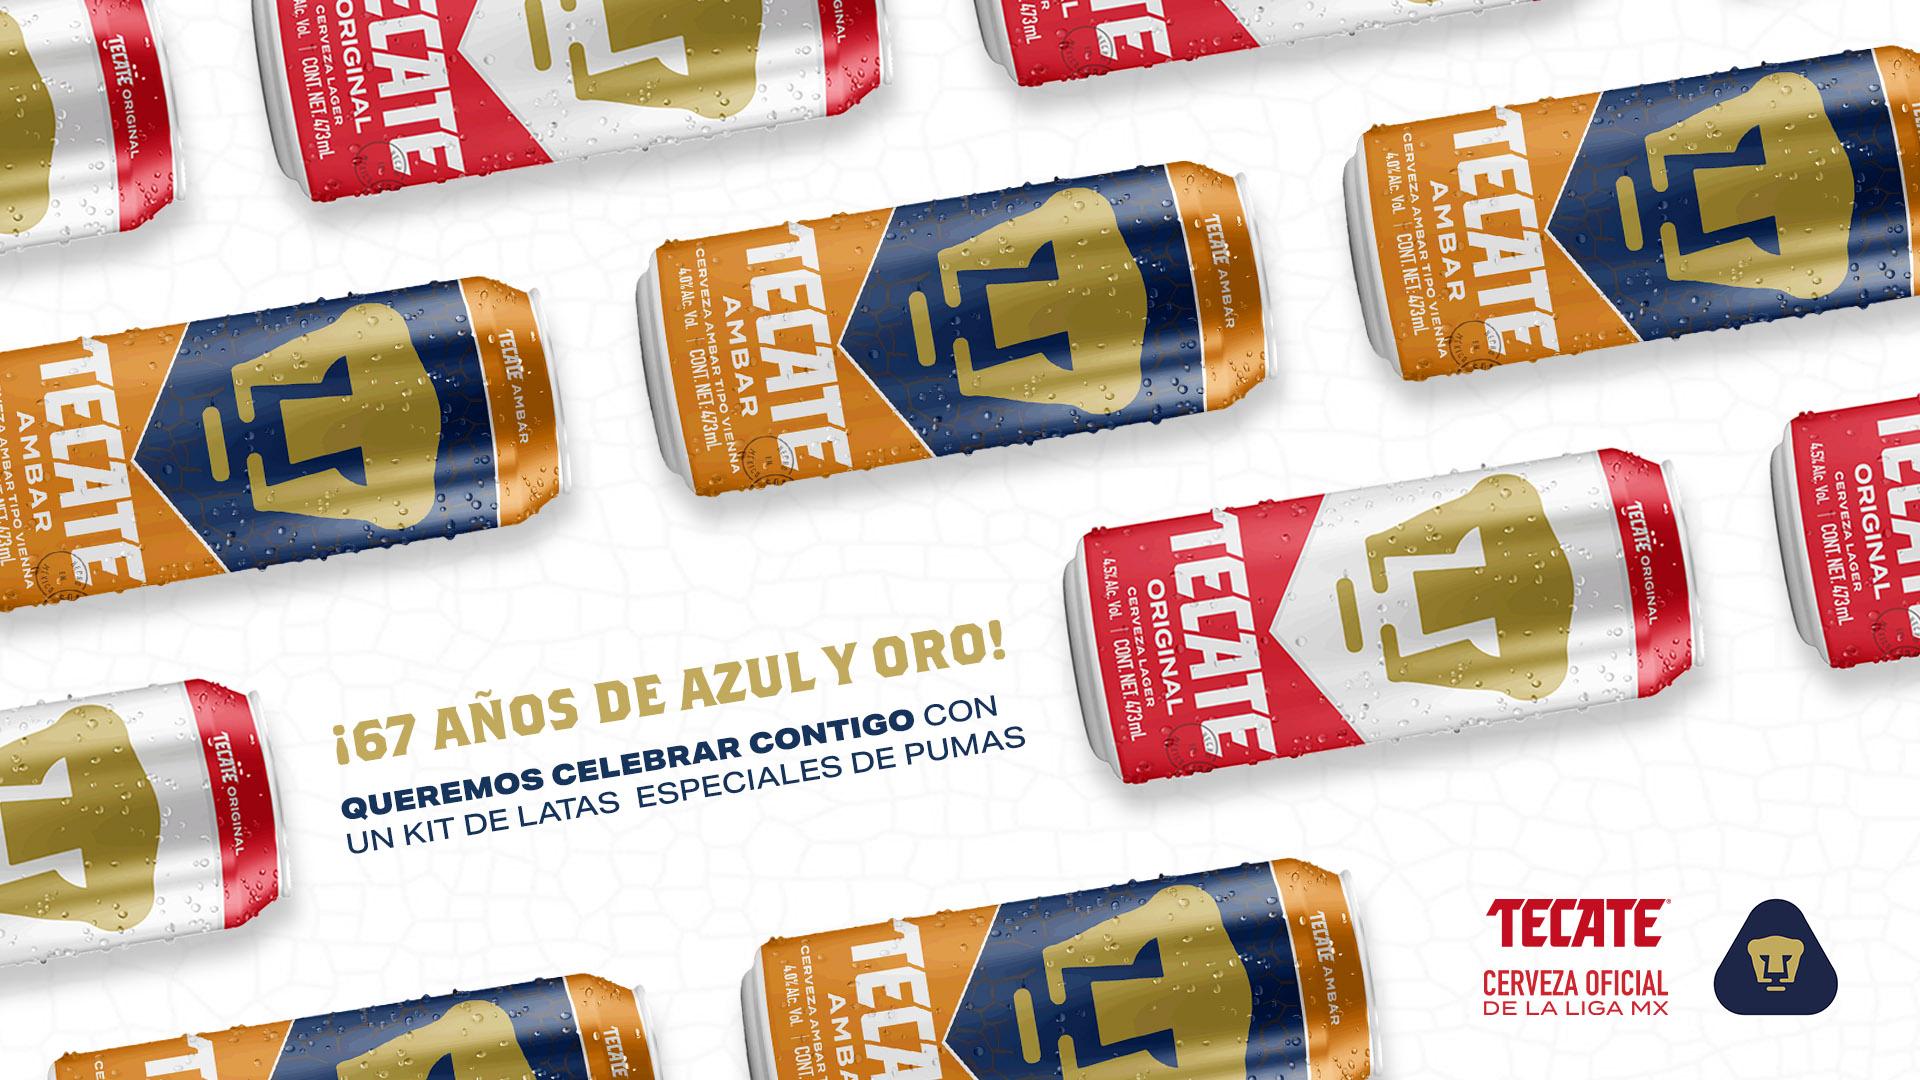 #CervezaOficial Twitter